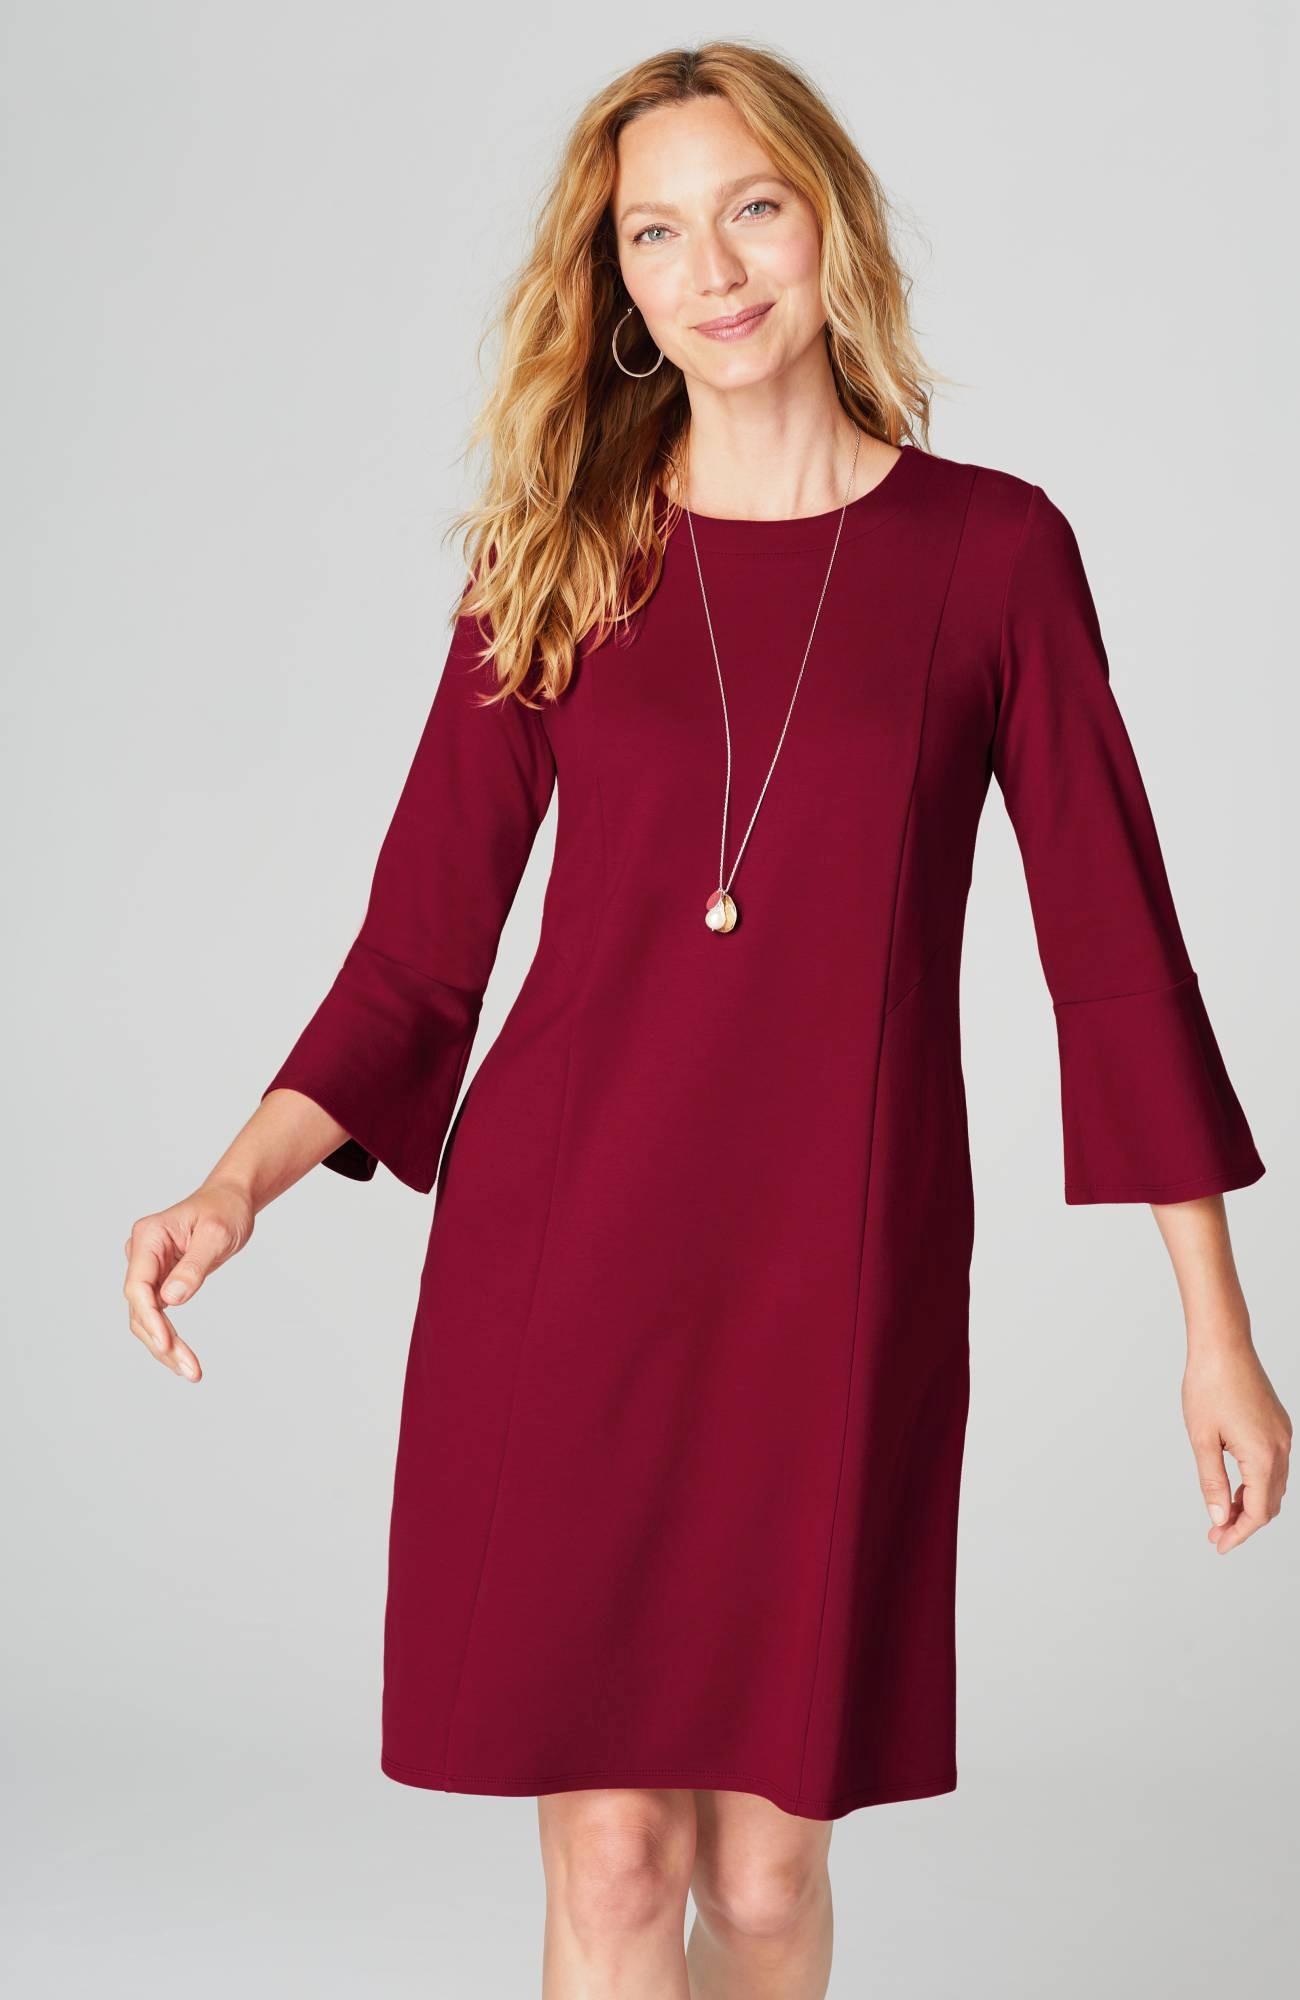 Ponte Knit Multiseamed Dress | JJill